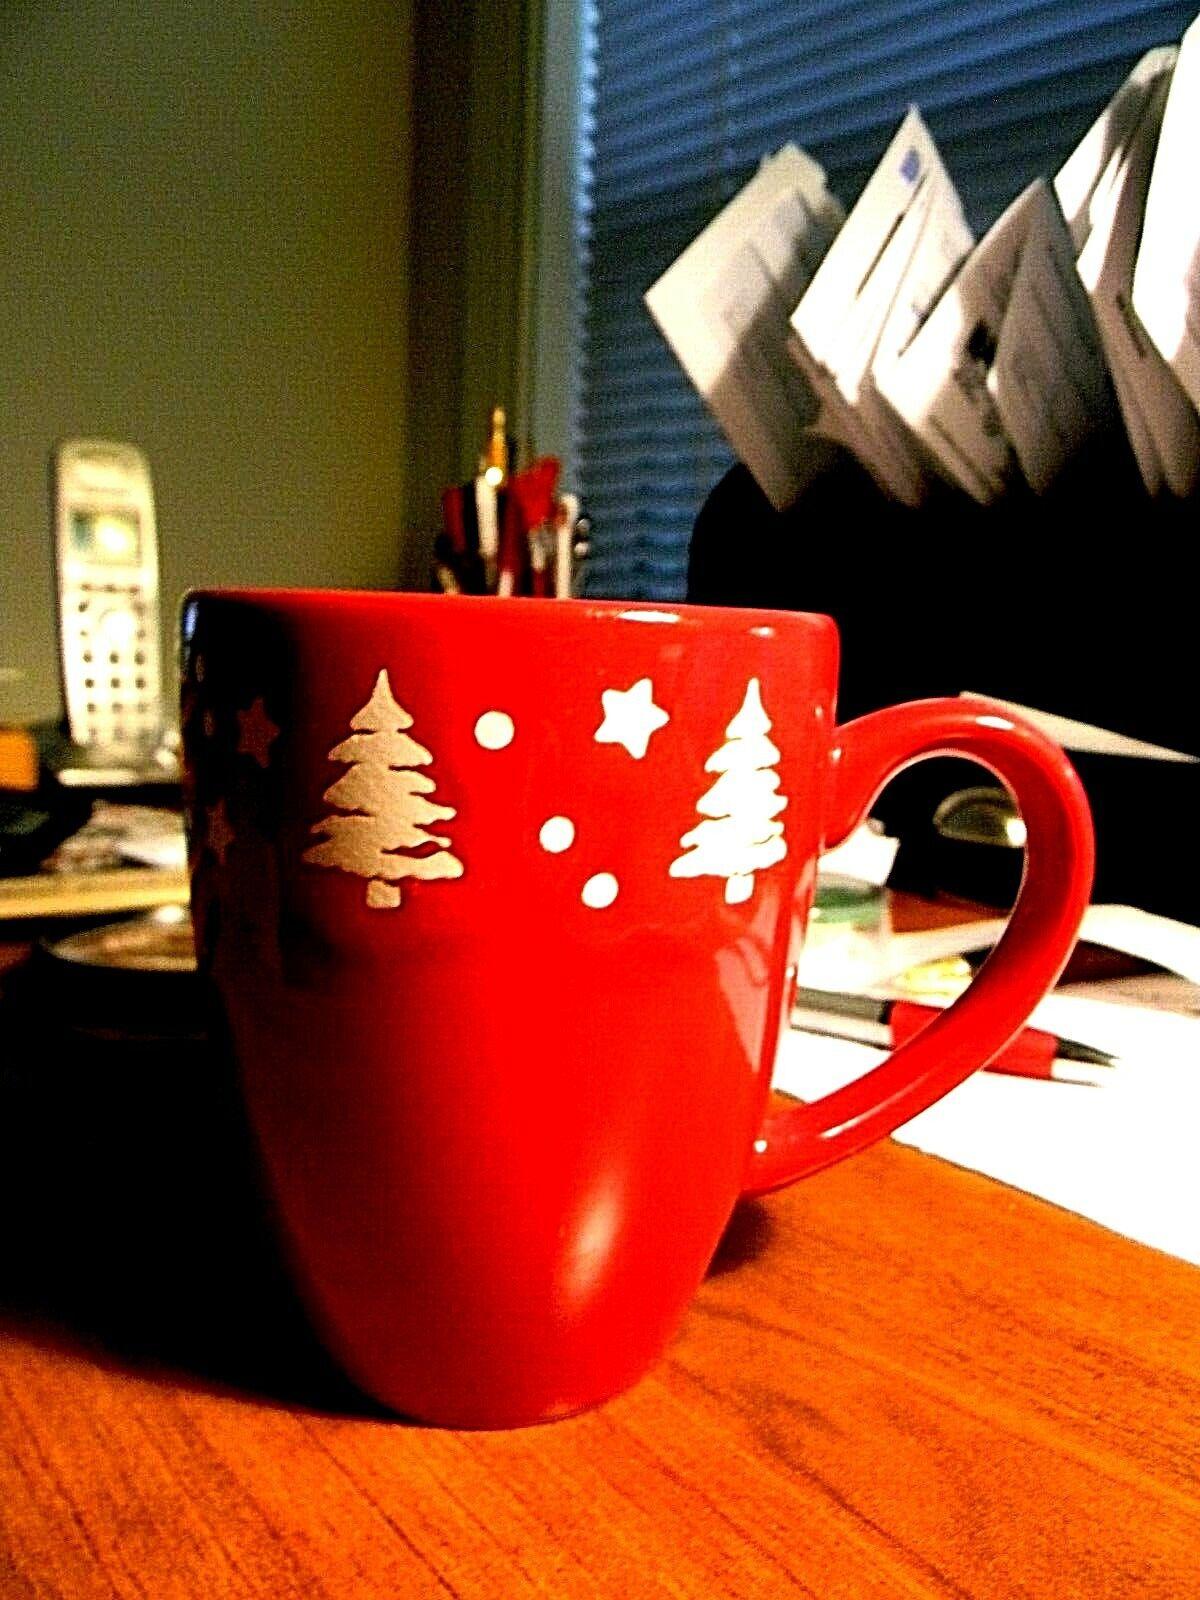 Waechtersbach Germany Fun Factory Christmas Holiday Red Mug